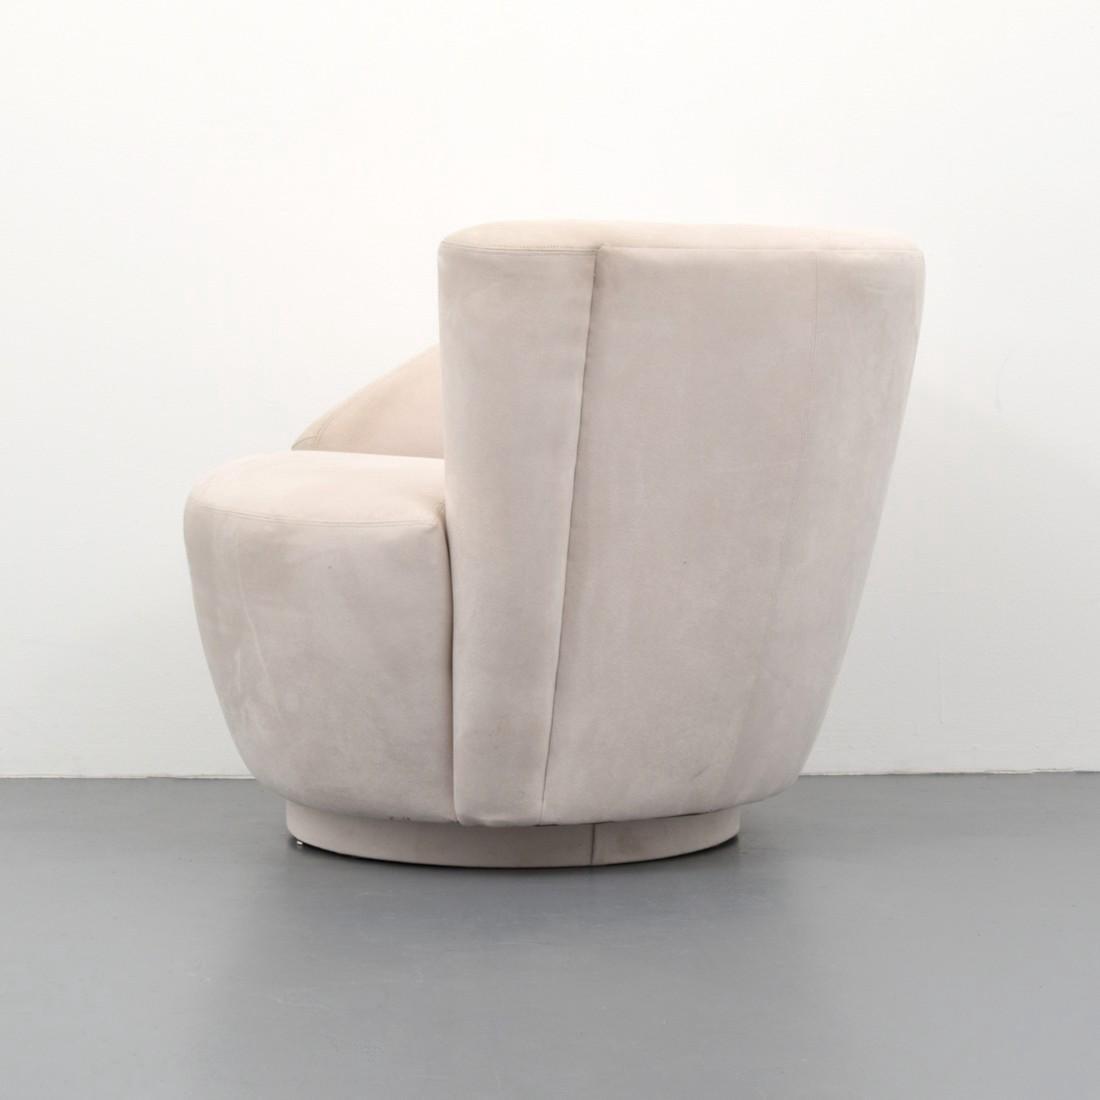 Vladimir Kagan CORKSCREW Swivel Lounge Chair - 4